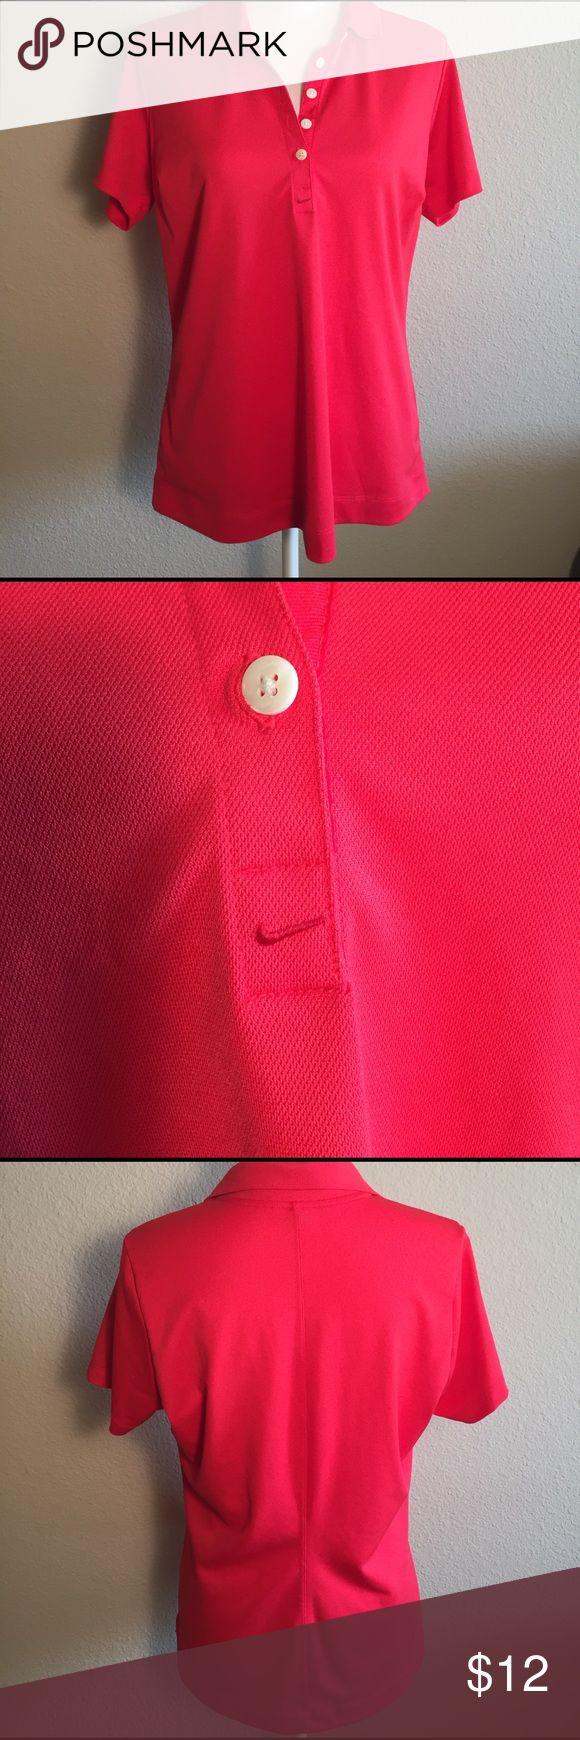 Nike women's golf shirt Medium. Dri fit. Bright orange red. Size large. Nike Tops Tees - Short Sleeve